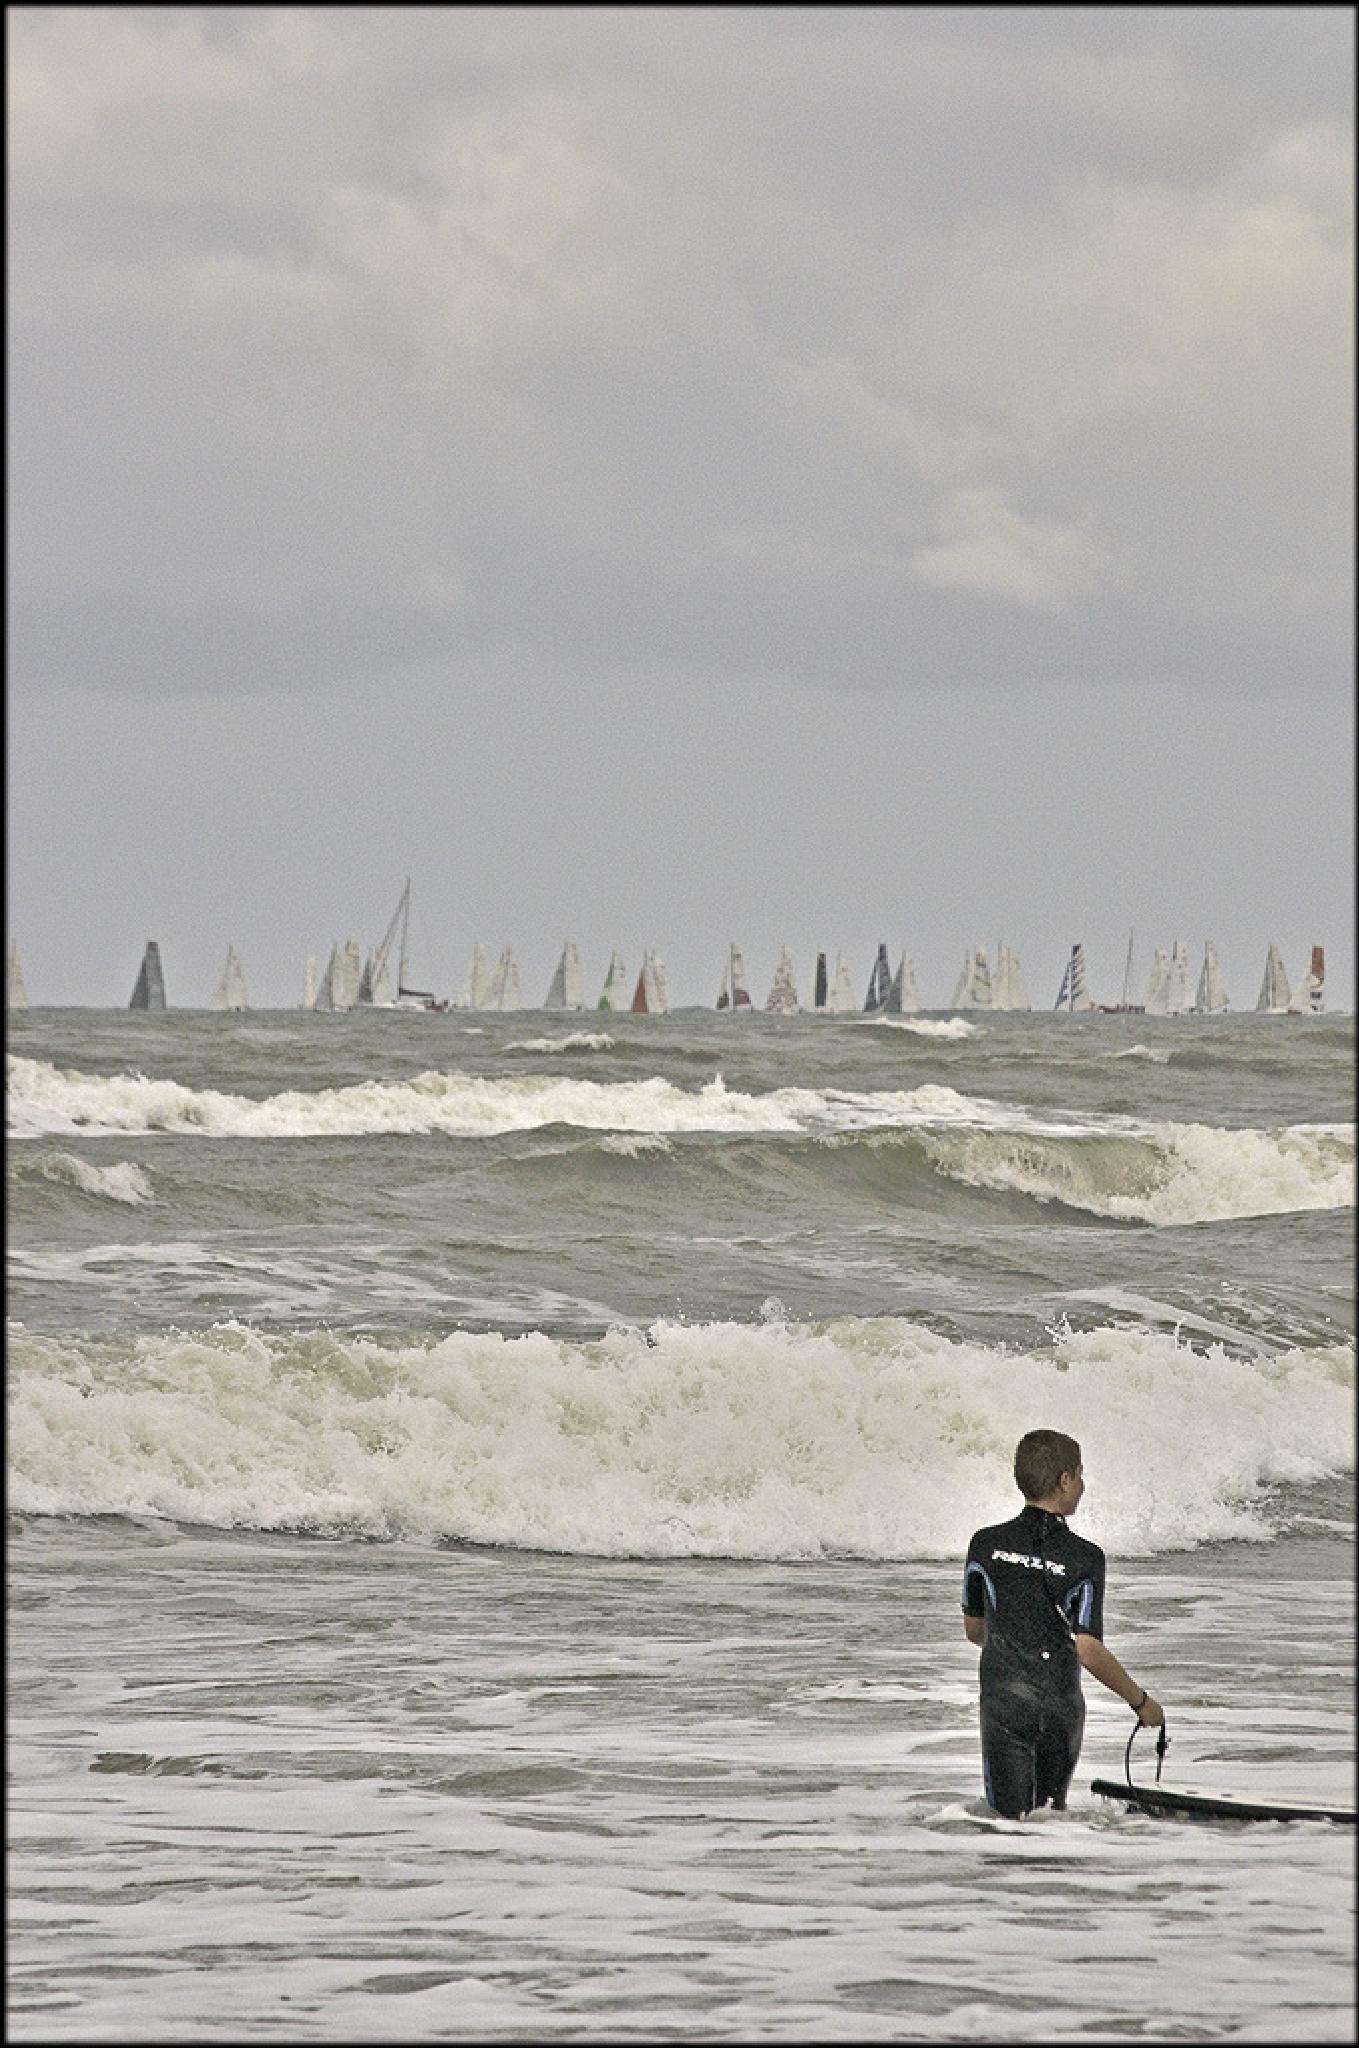 DSC1008-2013 July 30th by Gilles Le Corre